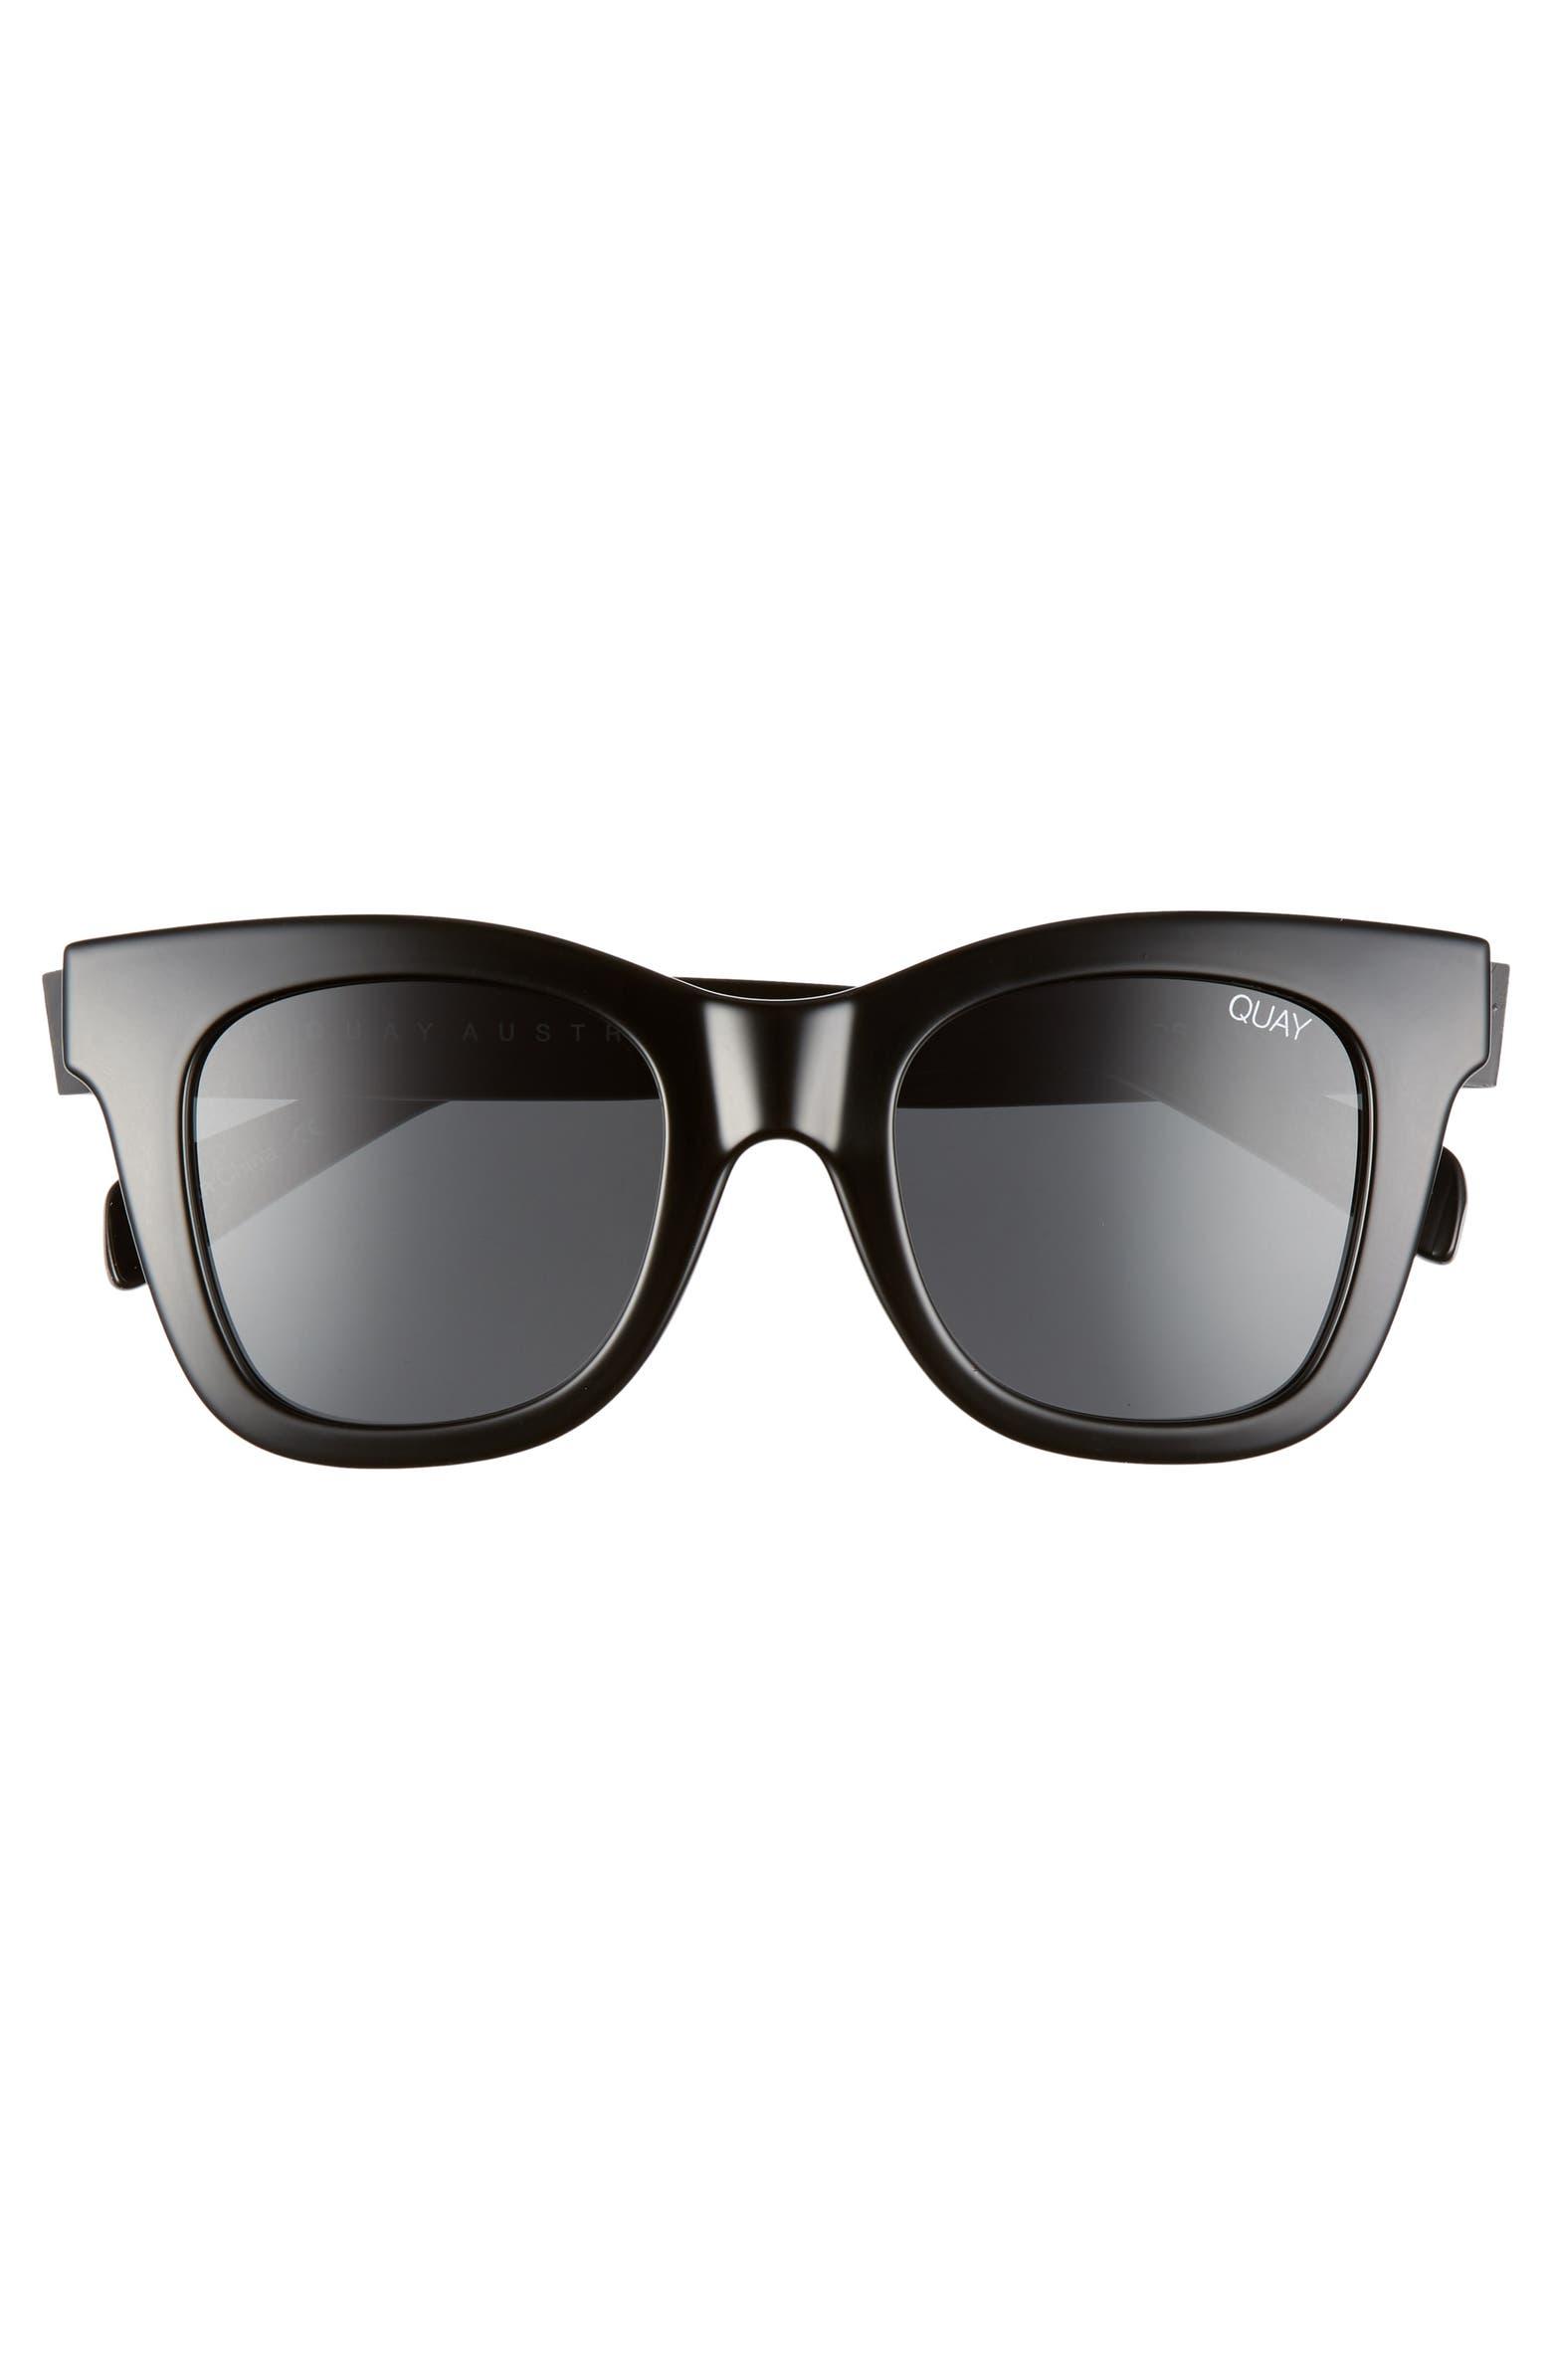 x Chrissy Teigen After Hours 45mm Polarized Square Sunglasses QUAY AUSTRALIA